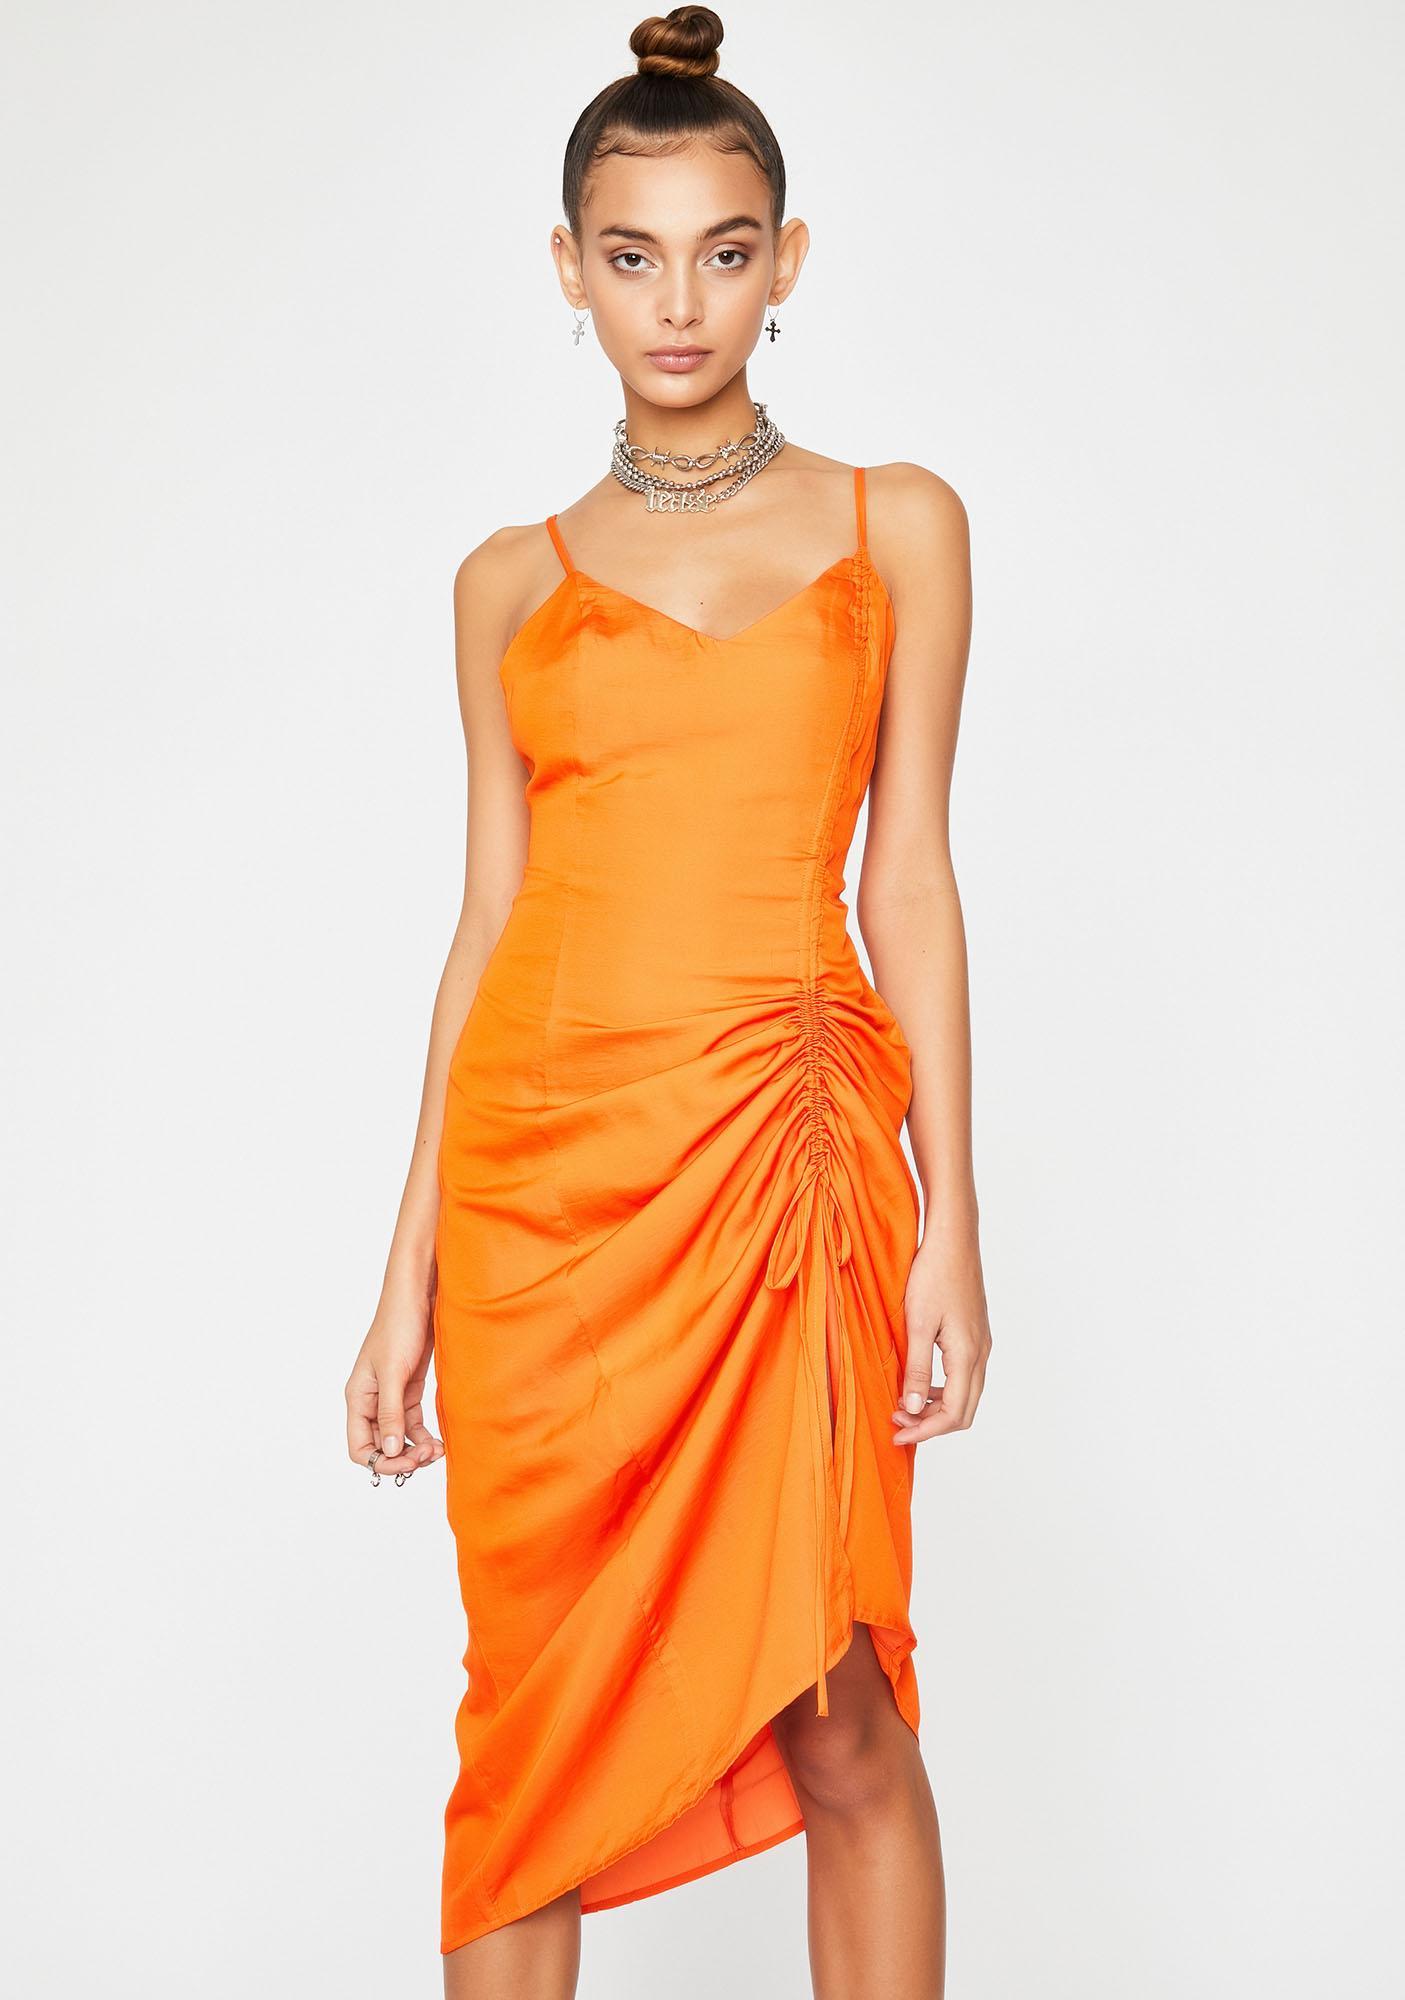 Juicy Flirtatious Bae Ruched Dress